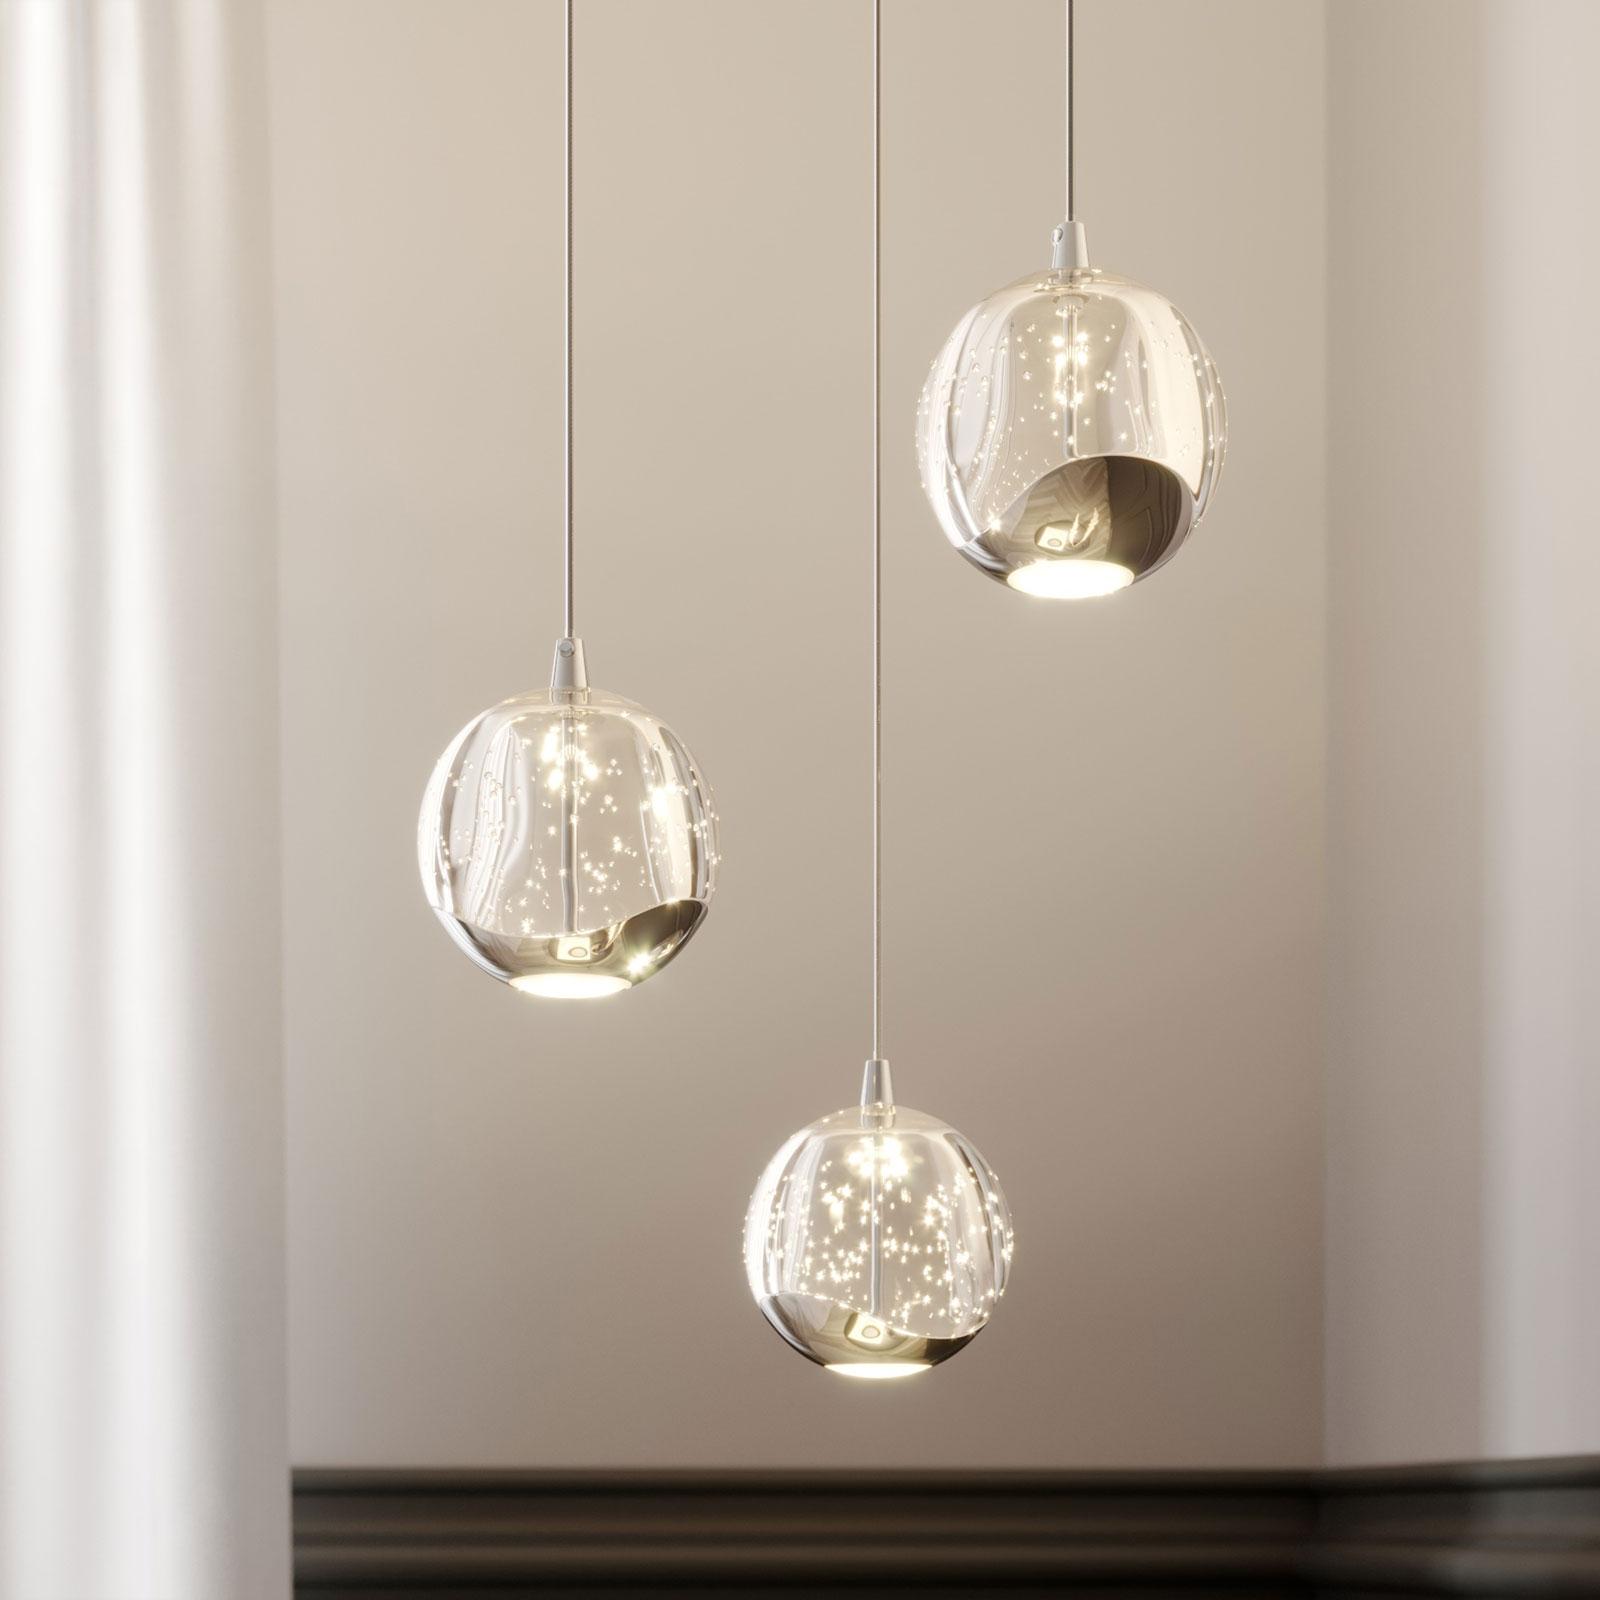 Lampada a sospensione LED Hayley, 3 luci, cromo